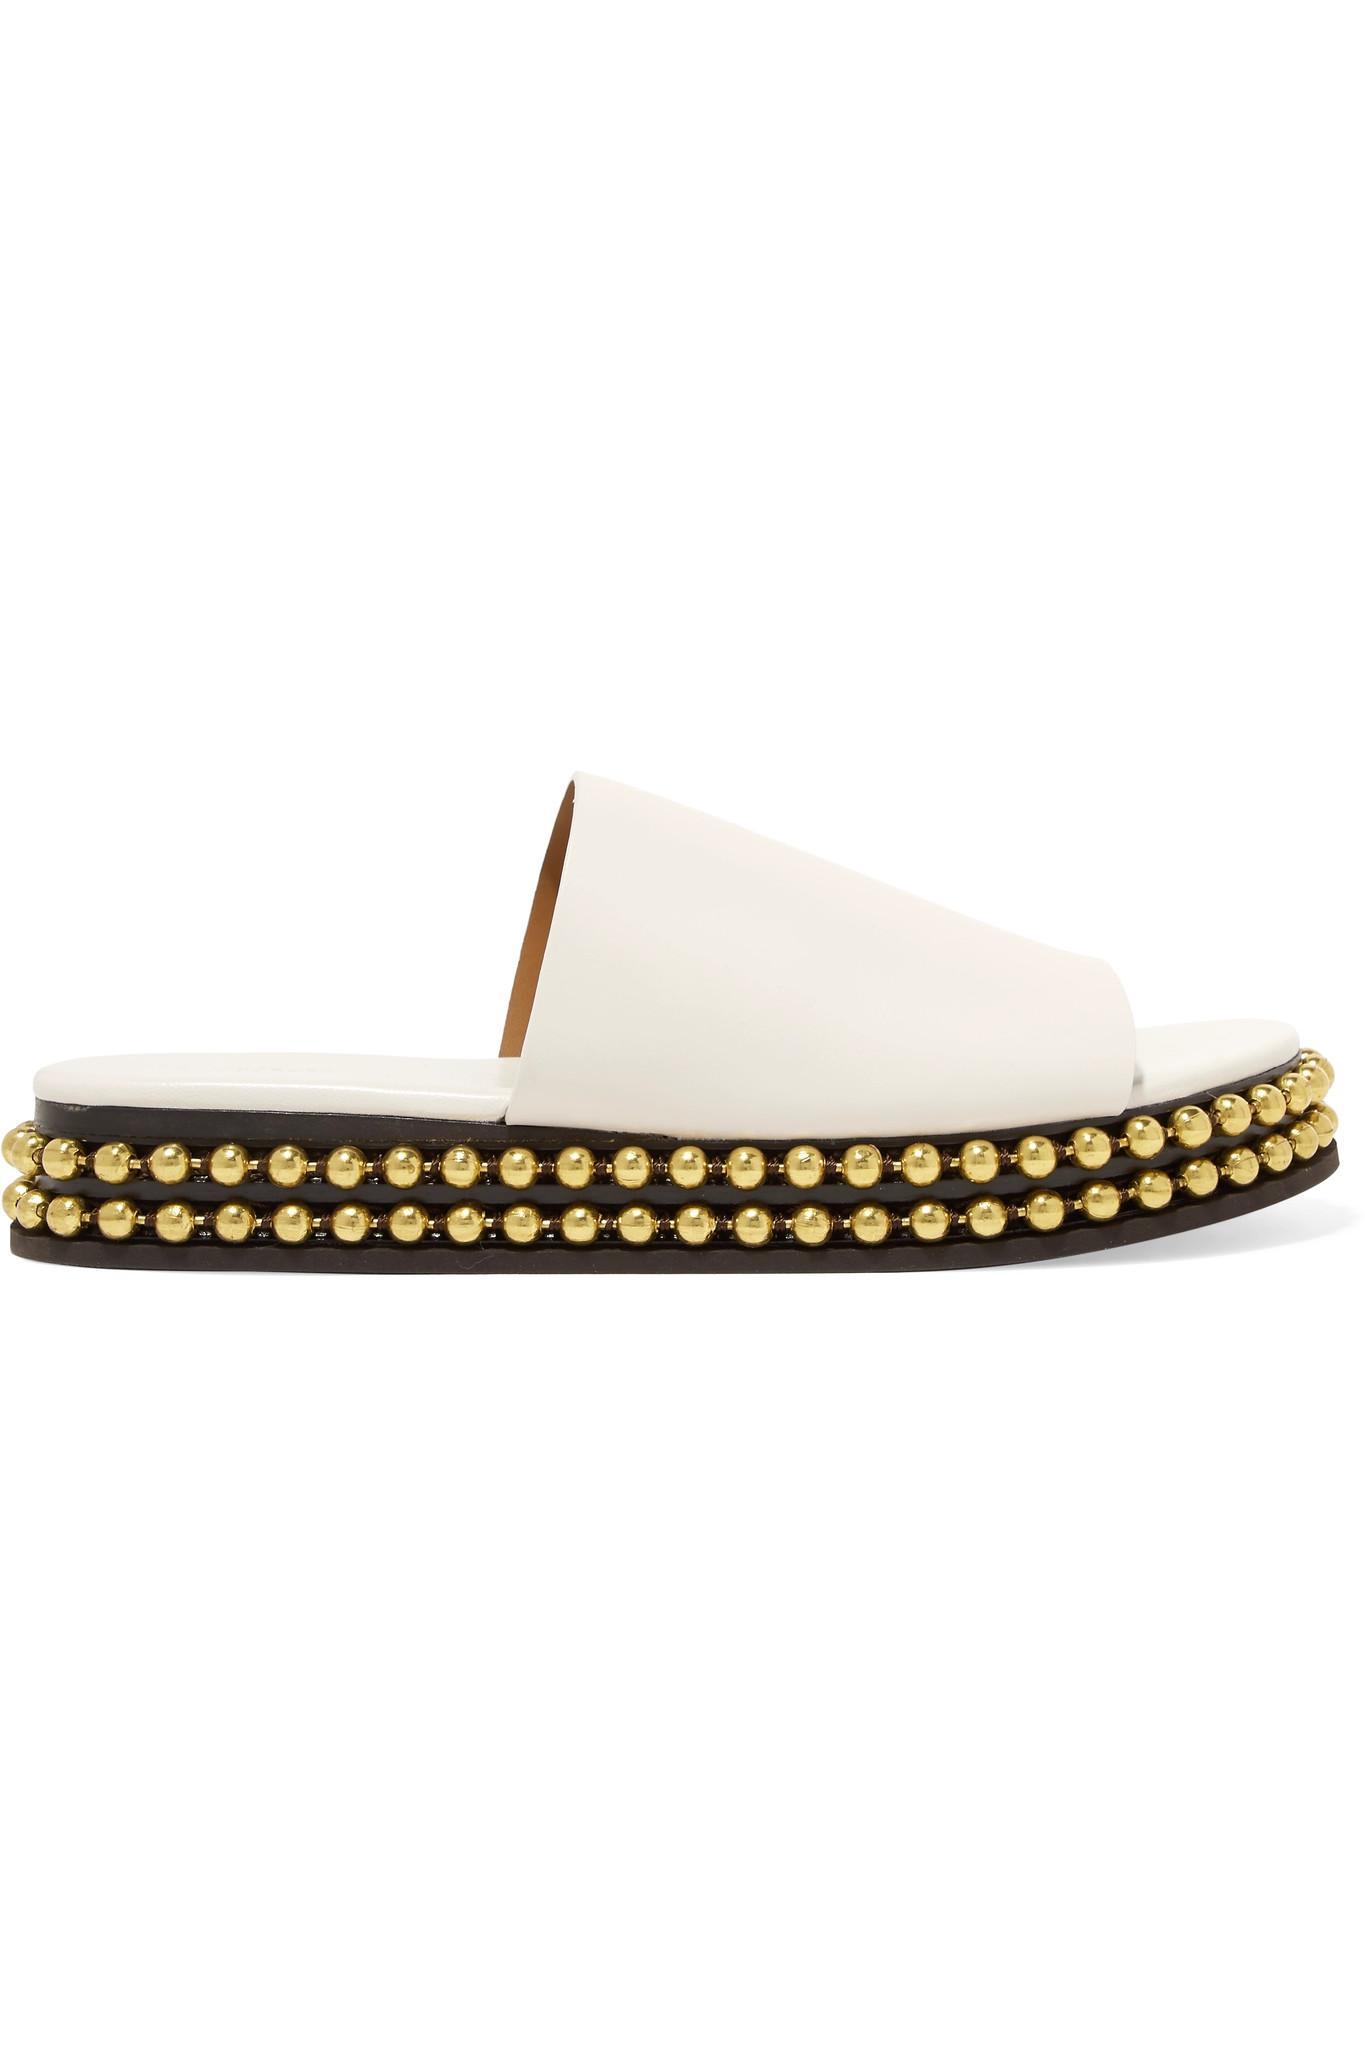 Sawyer Studded Leather Platform Slides - White Chlo uepMVy3t